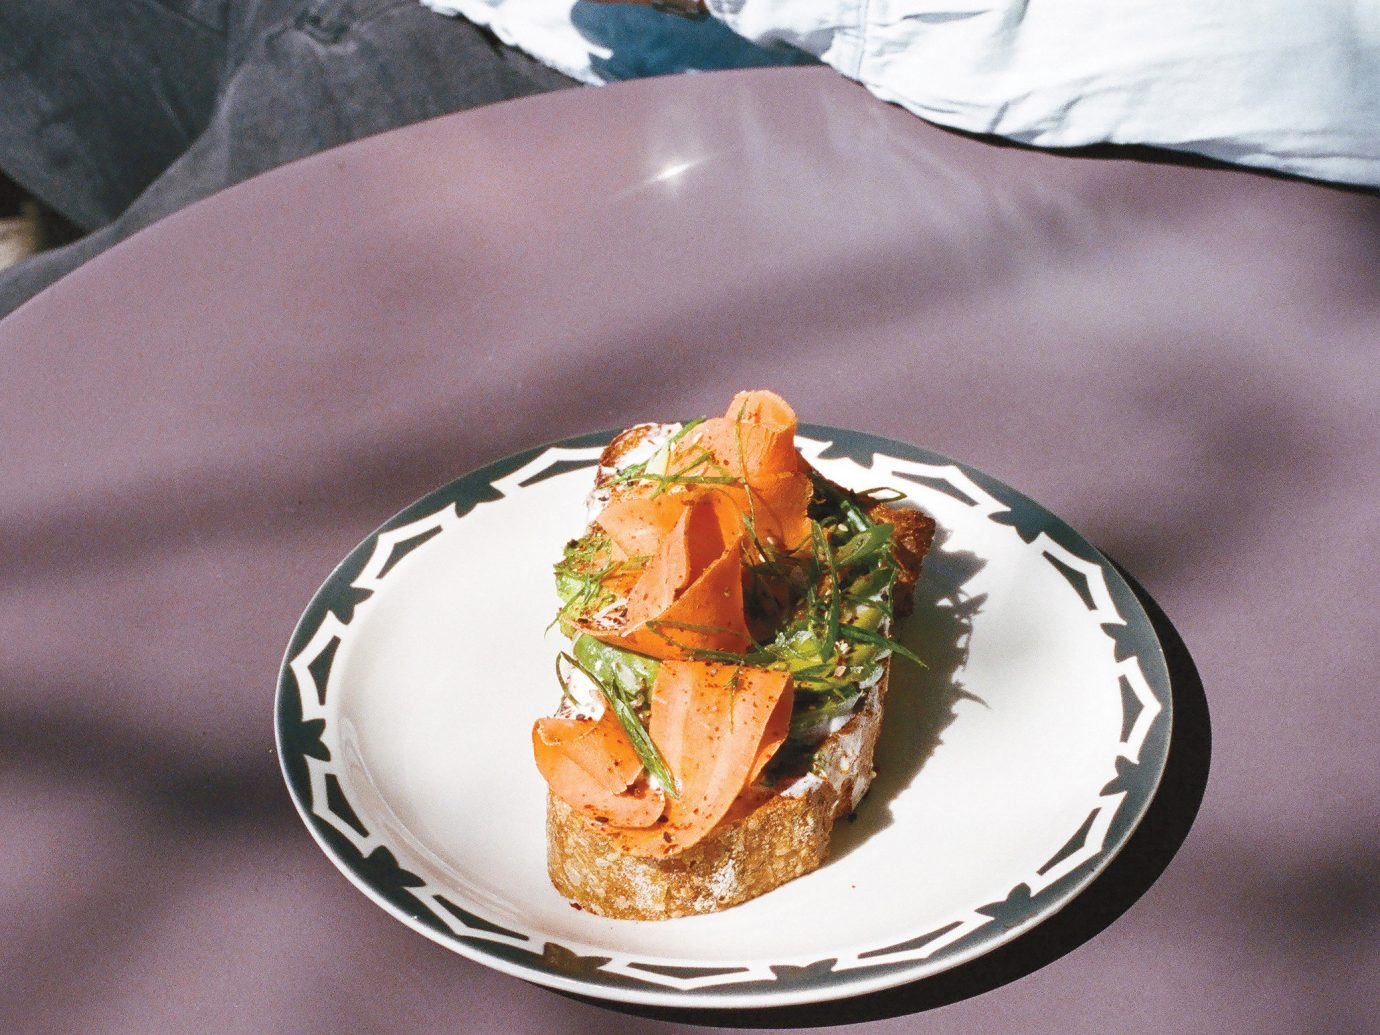 Food + Drink Health + Wellness Travel Tips plate person food dish meal fork sense restaurant dinner cuisine dessert eaten